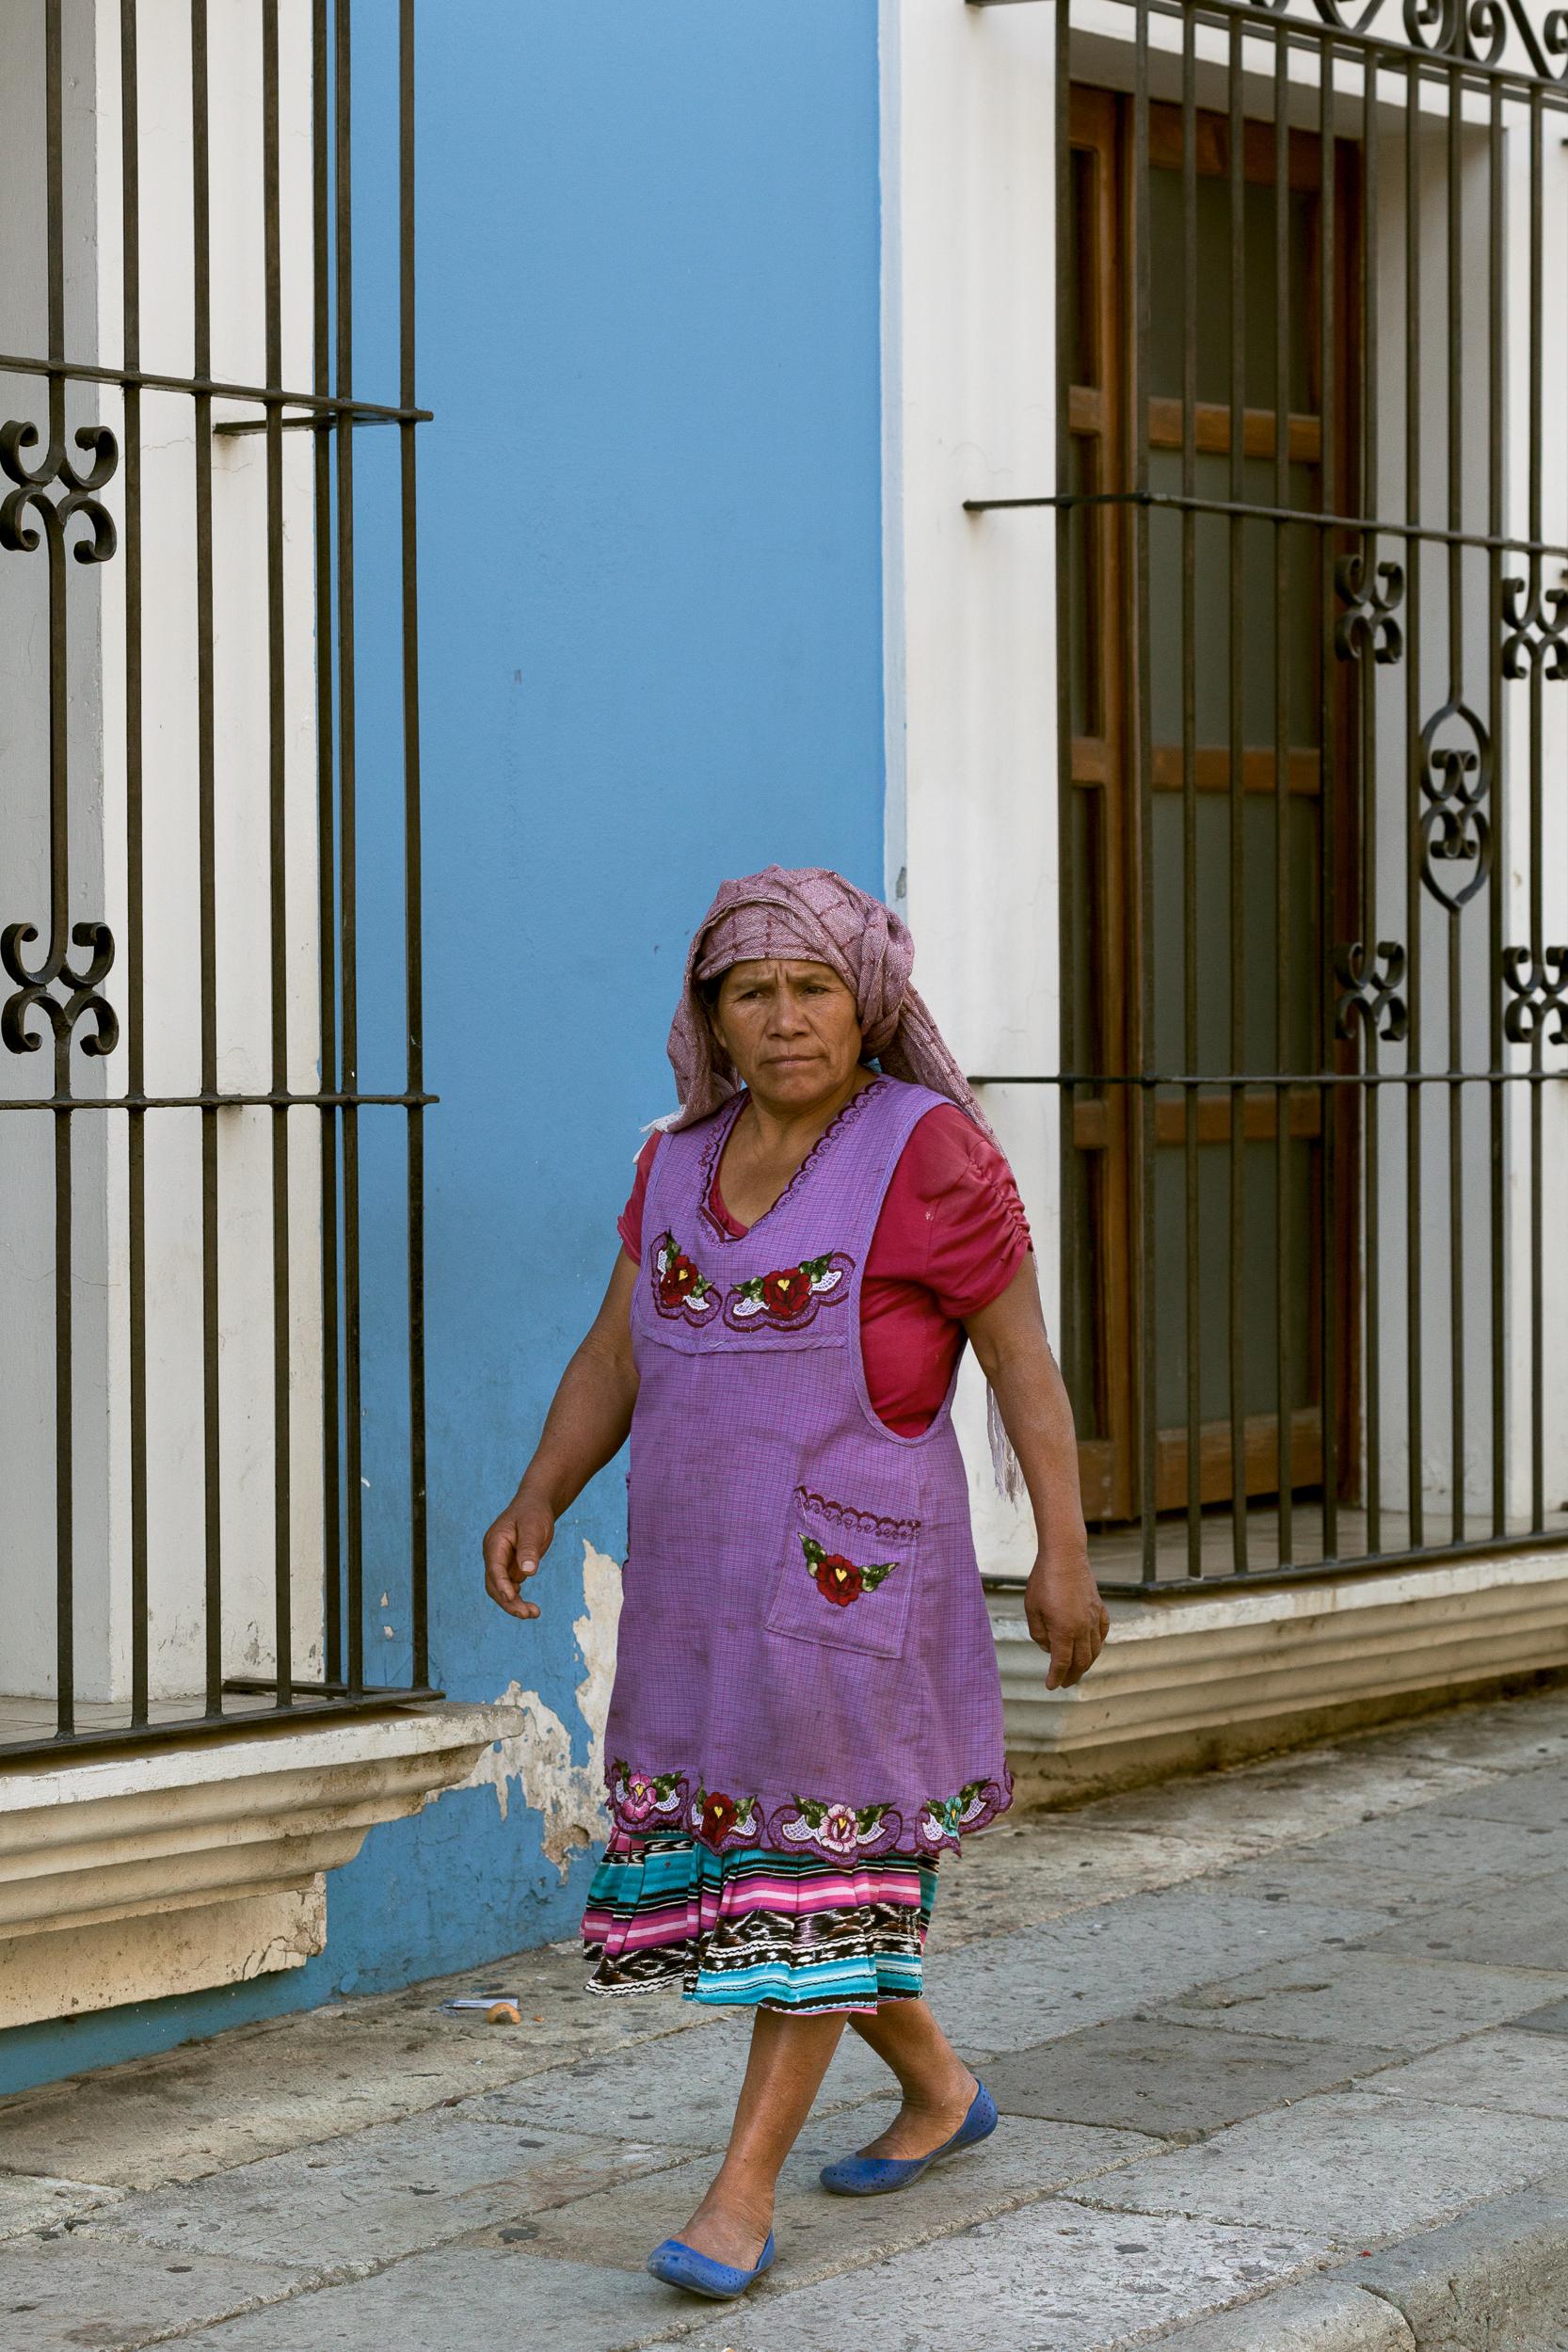 Chacon Images_Oaxaca_Travel_WEB_--3.jpg